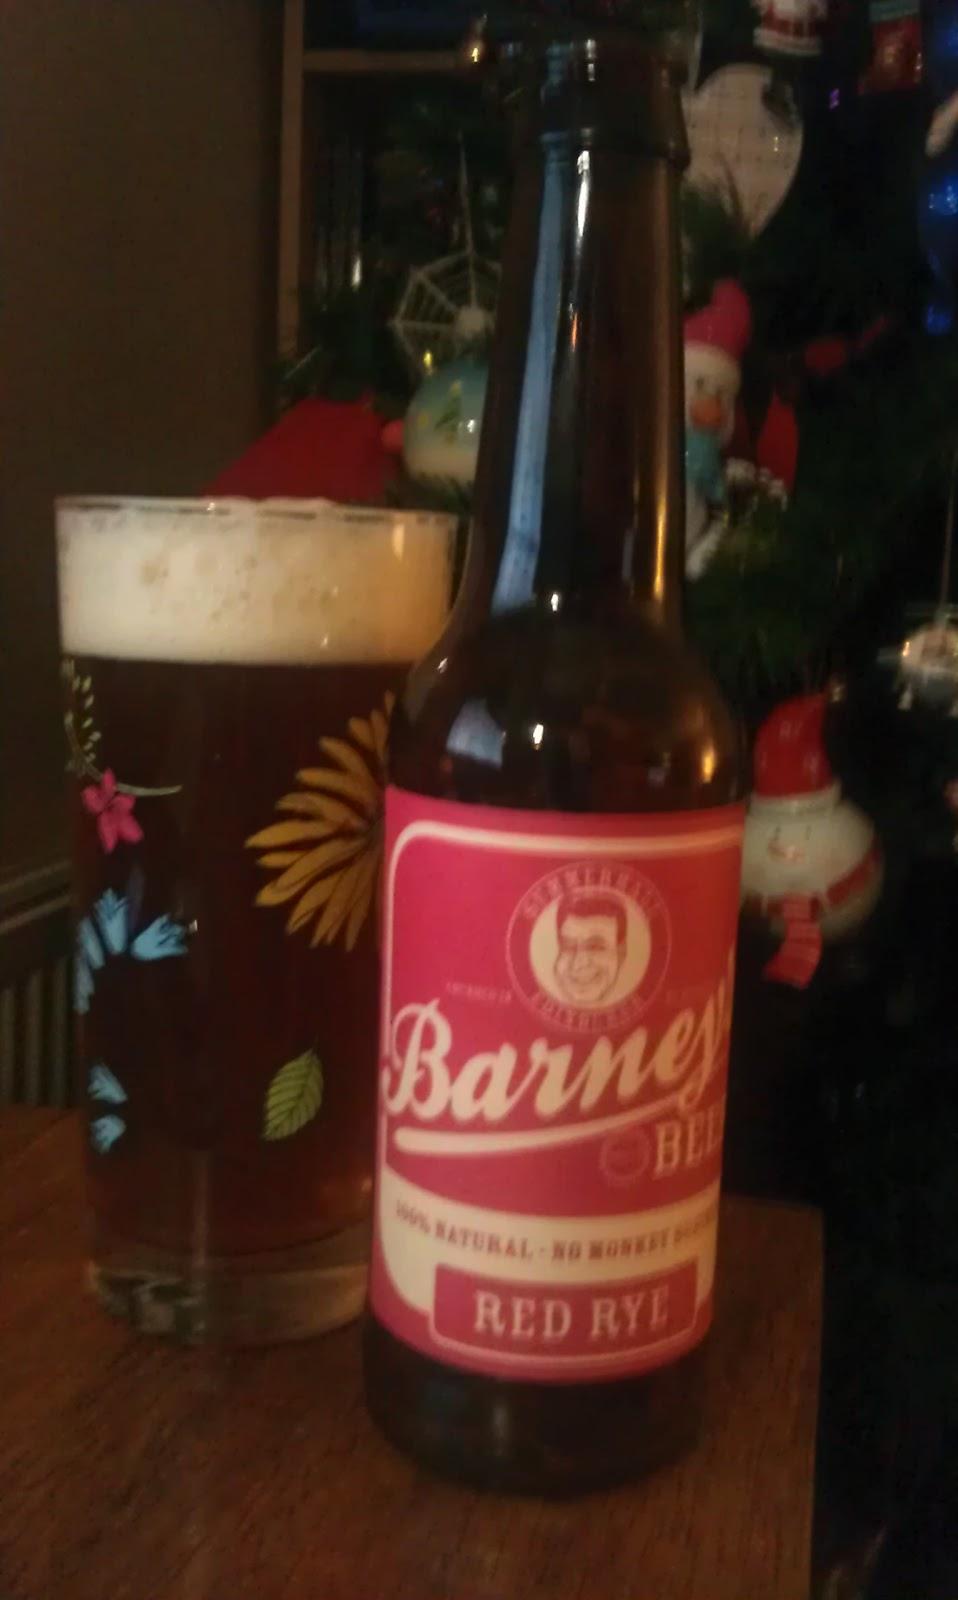 Barney Beer Red Rye